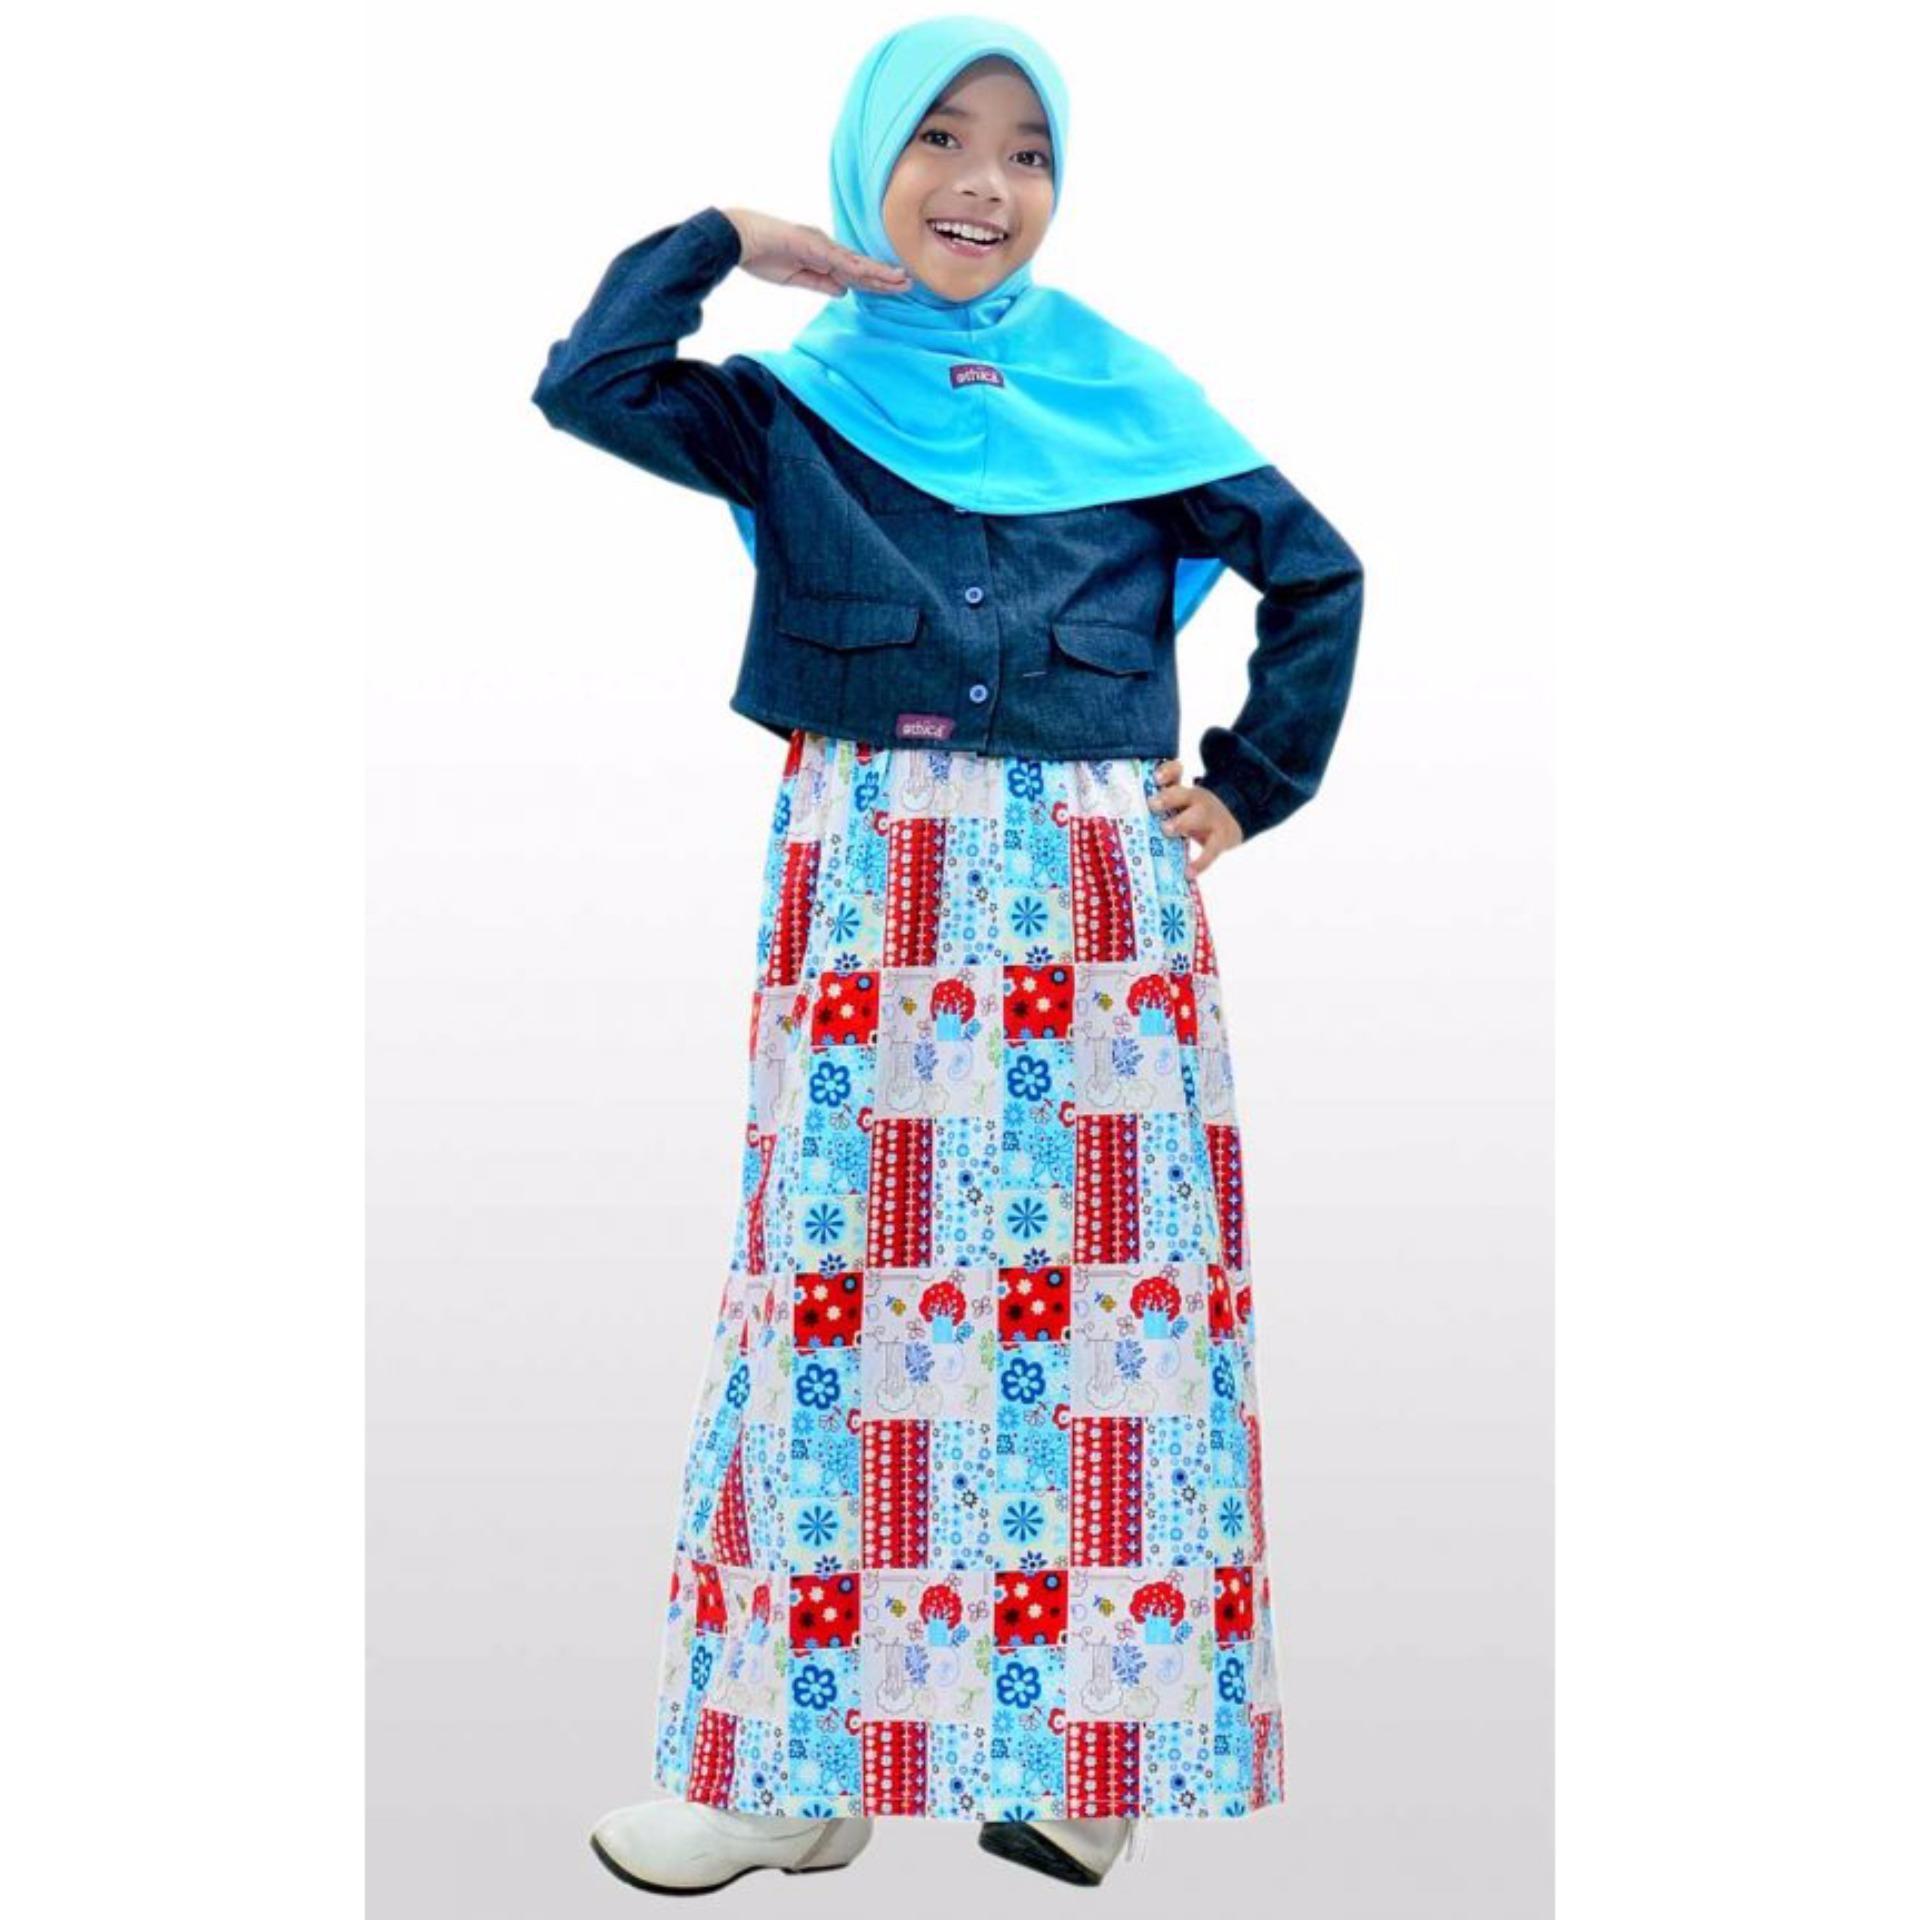 Ethica Moslem Fsahion Dress Anak OSK 57 (Biru)